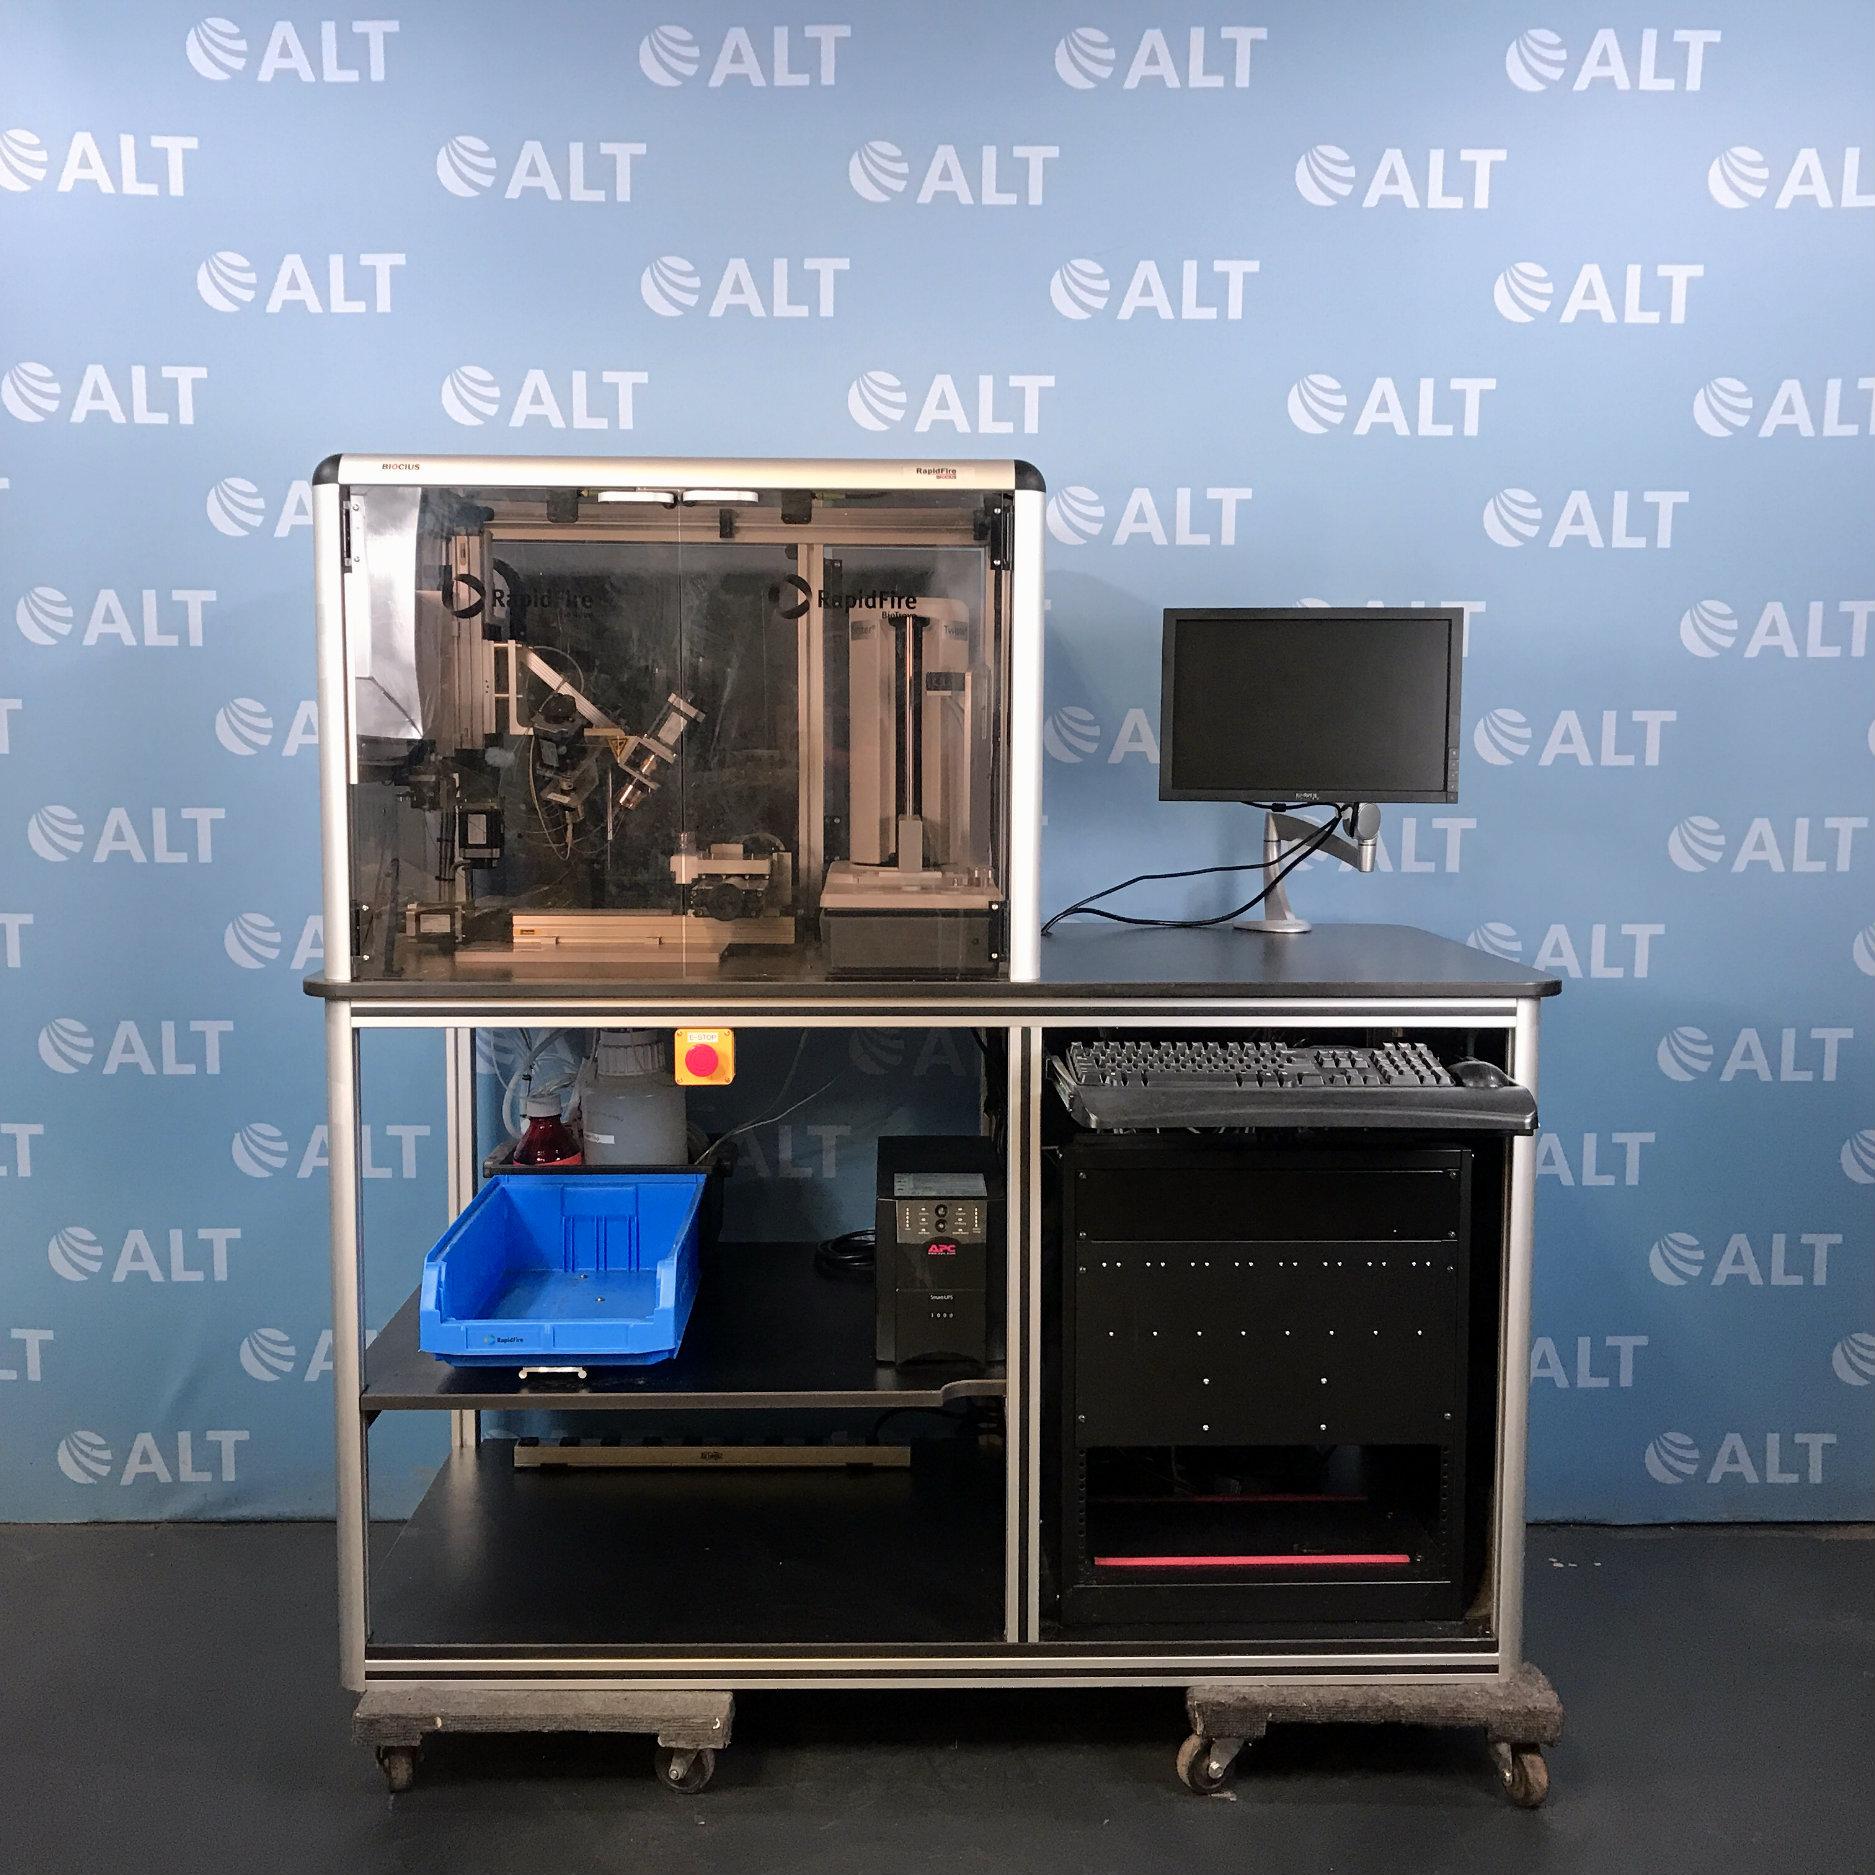 Agilent Technologies BioCius RapidFire 300 High-throughput Mass Spectrometry System  Image